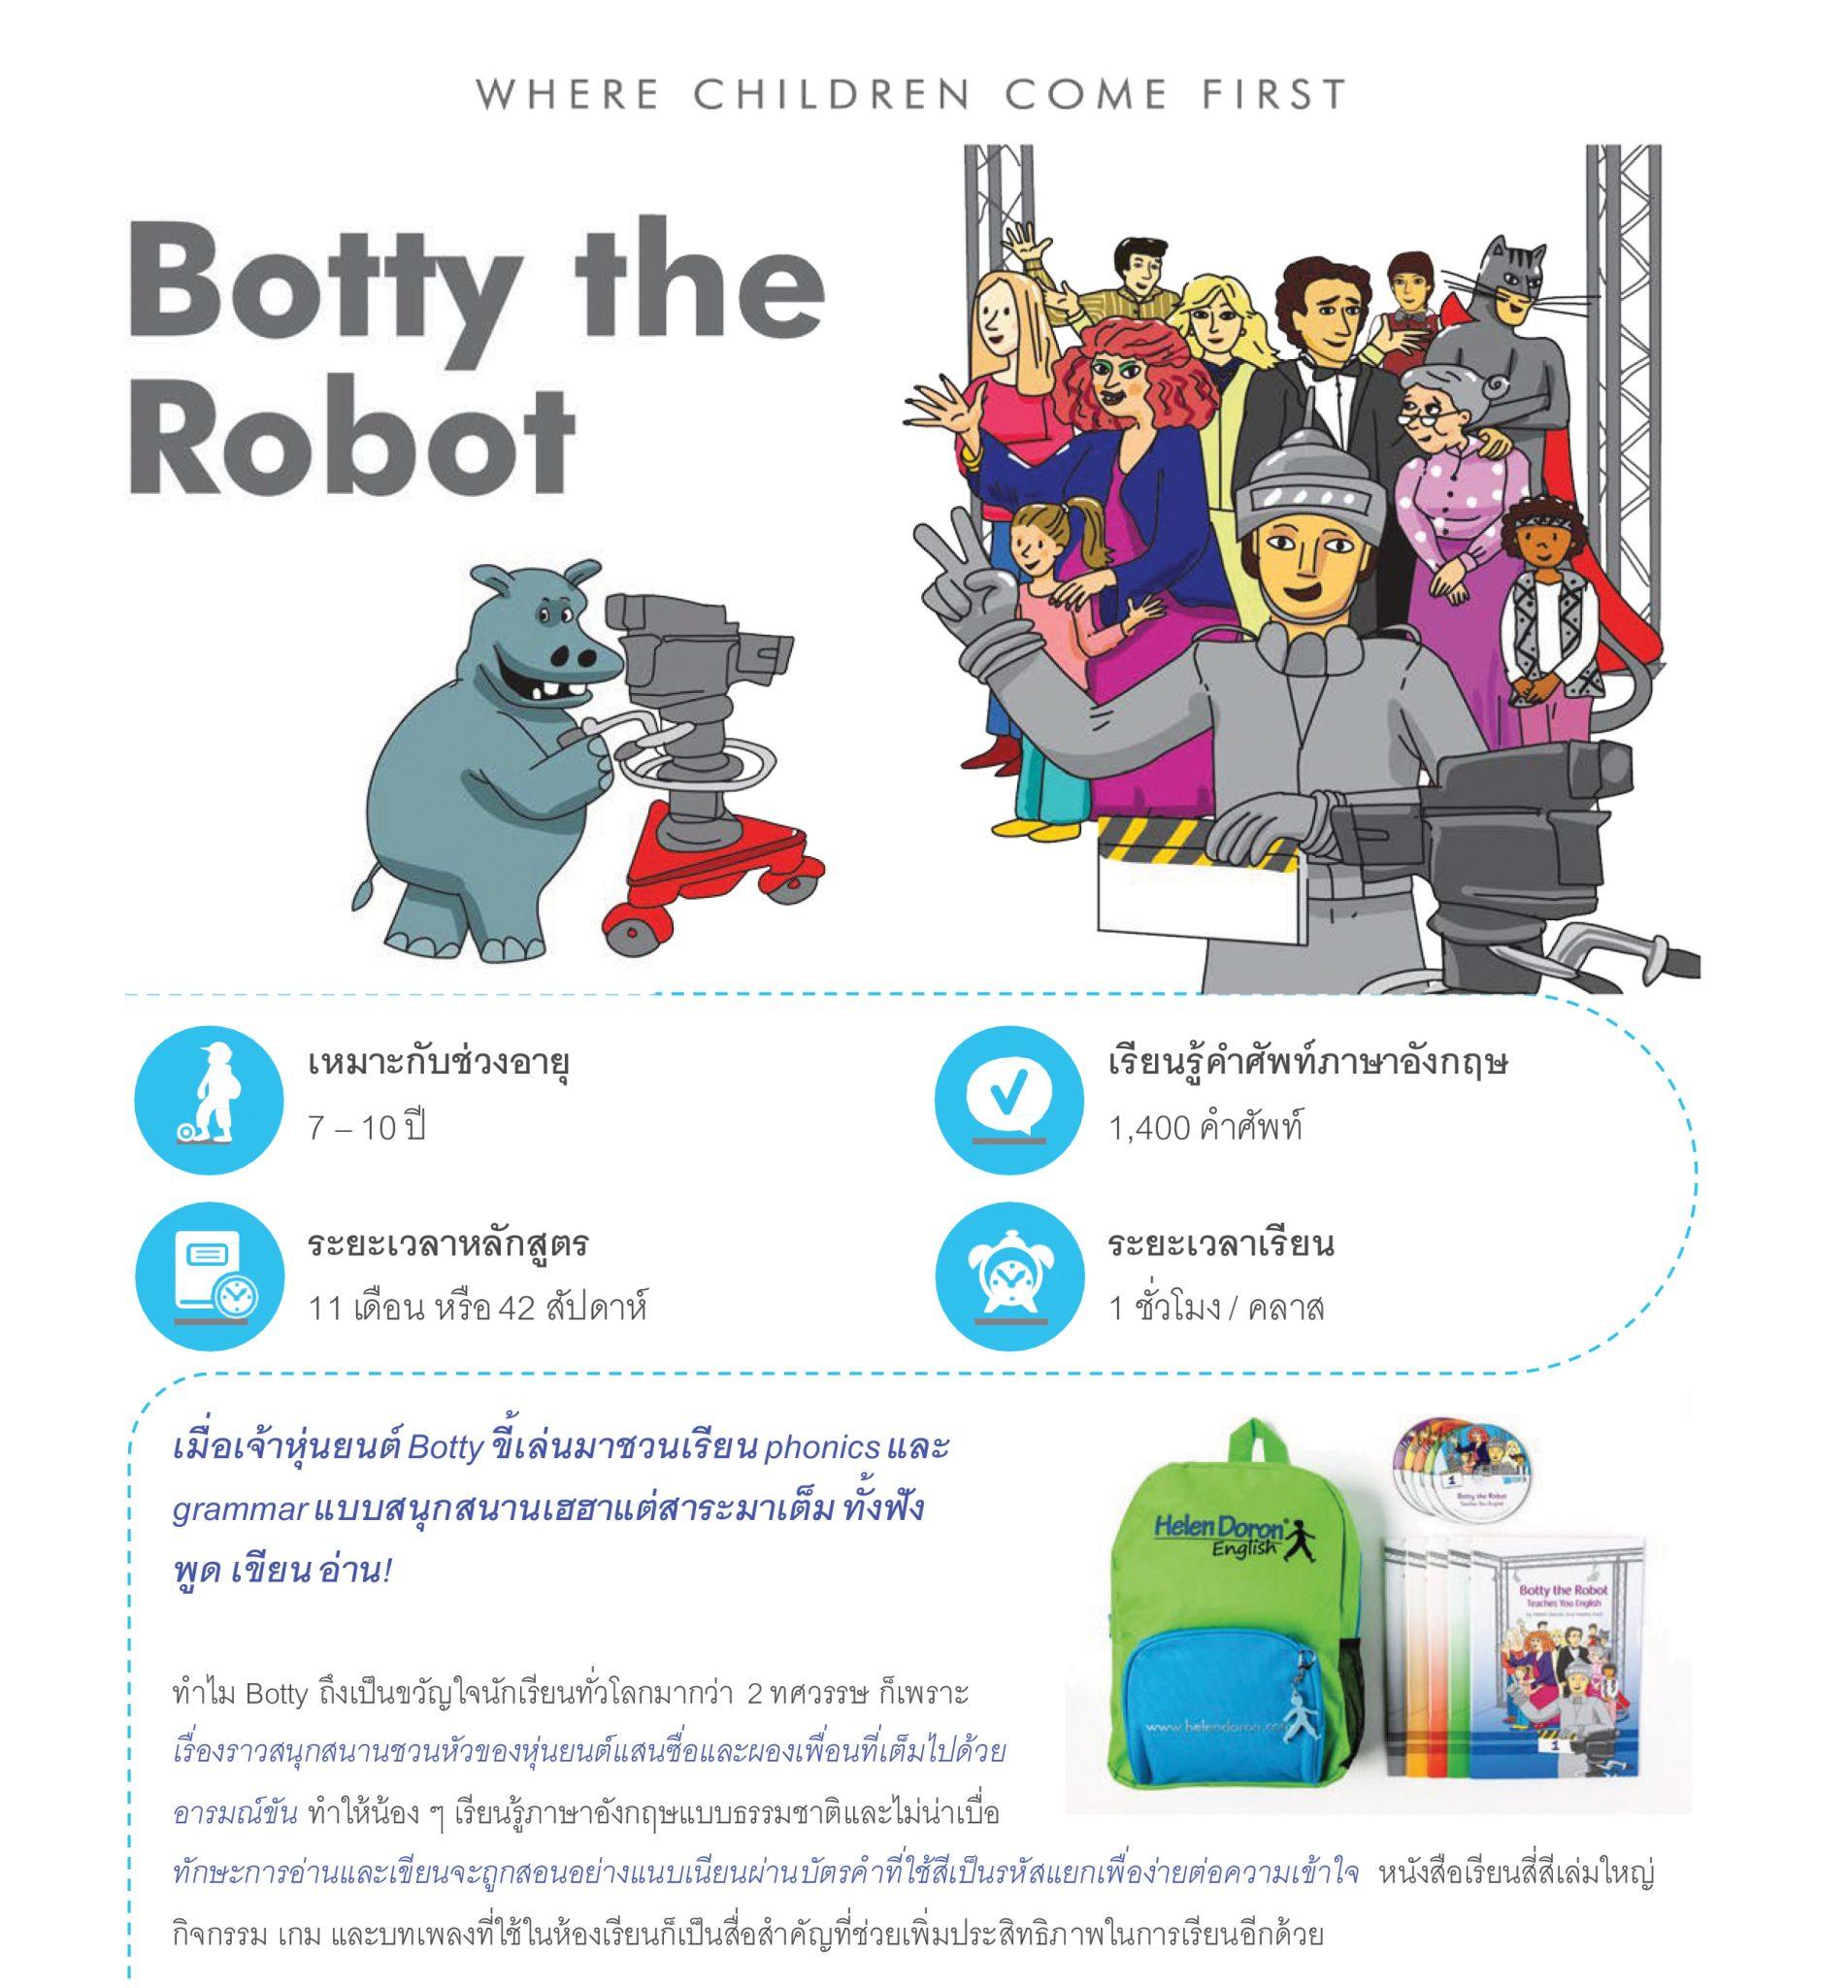 Download - Botty the Robot สำหรับเด็กอายุ 7 - 10 ปี